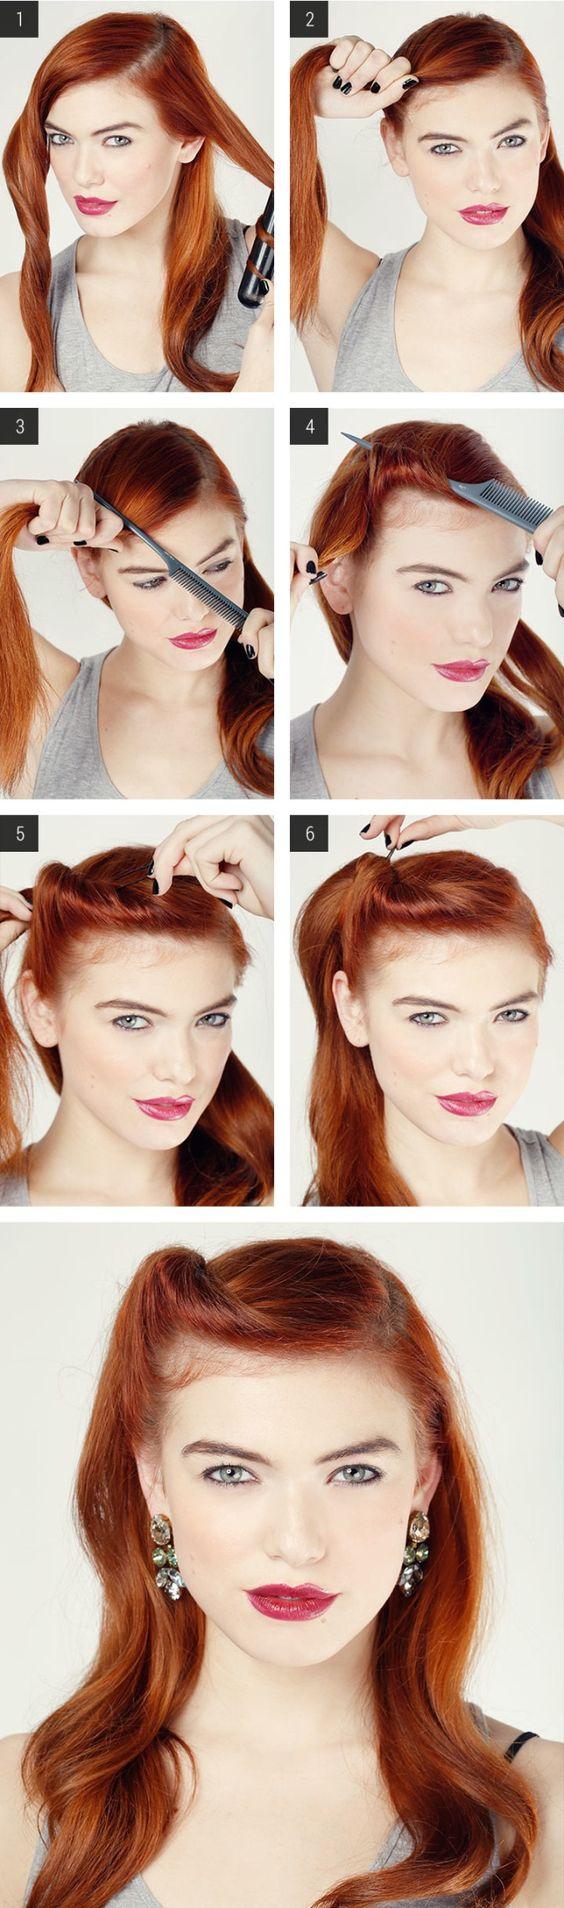 20 elegant retro hairstyles 2019 - vintage hairstyles for